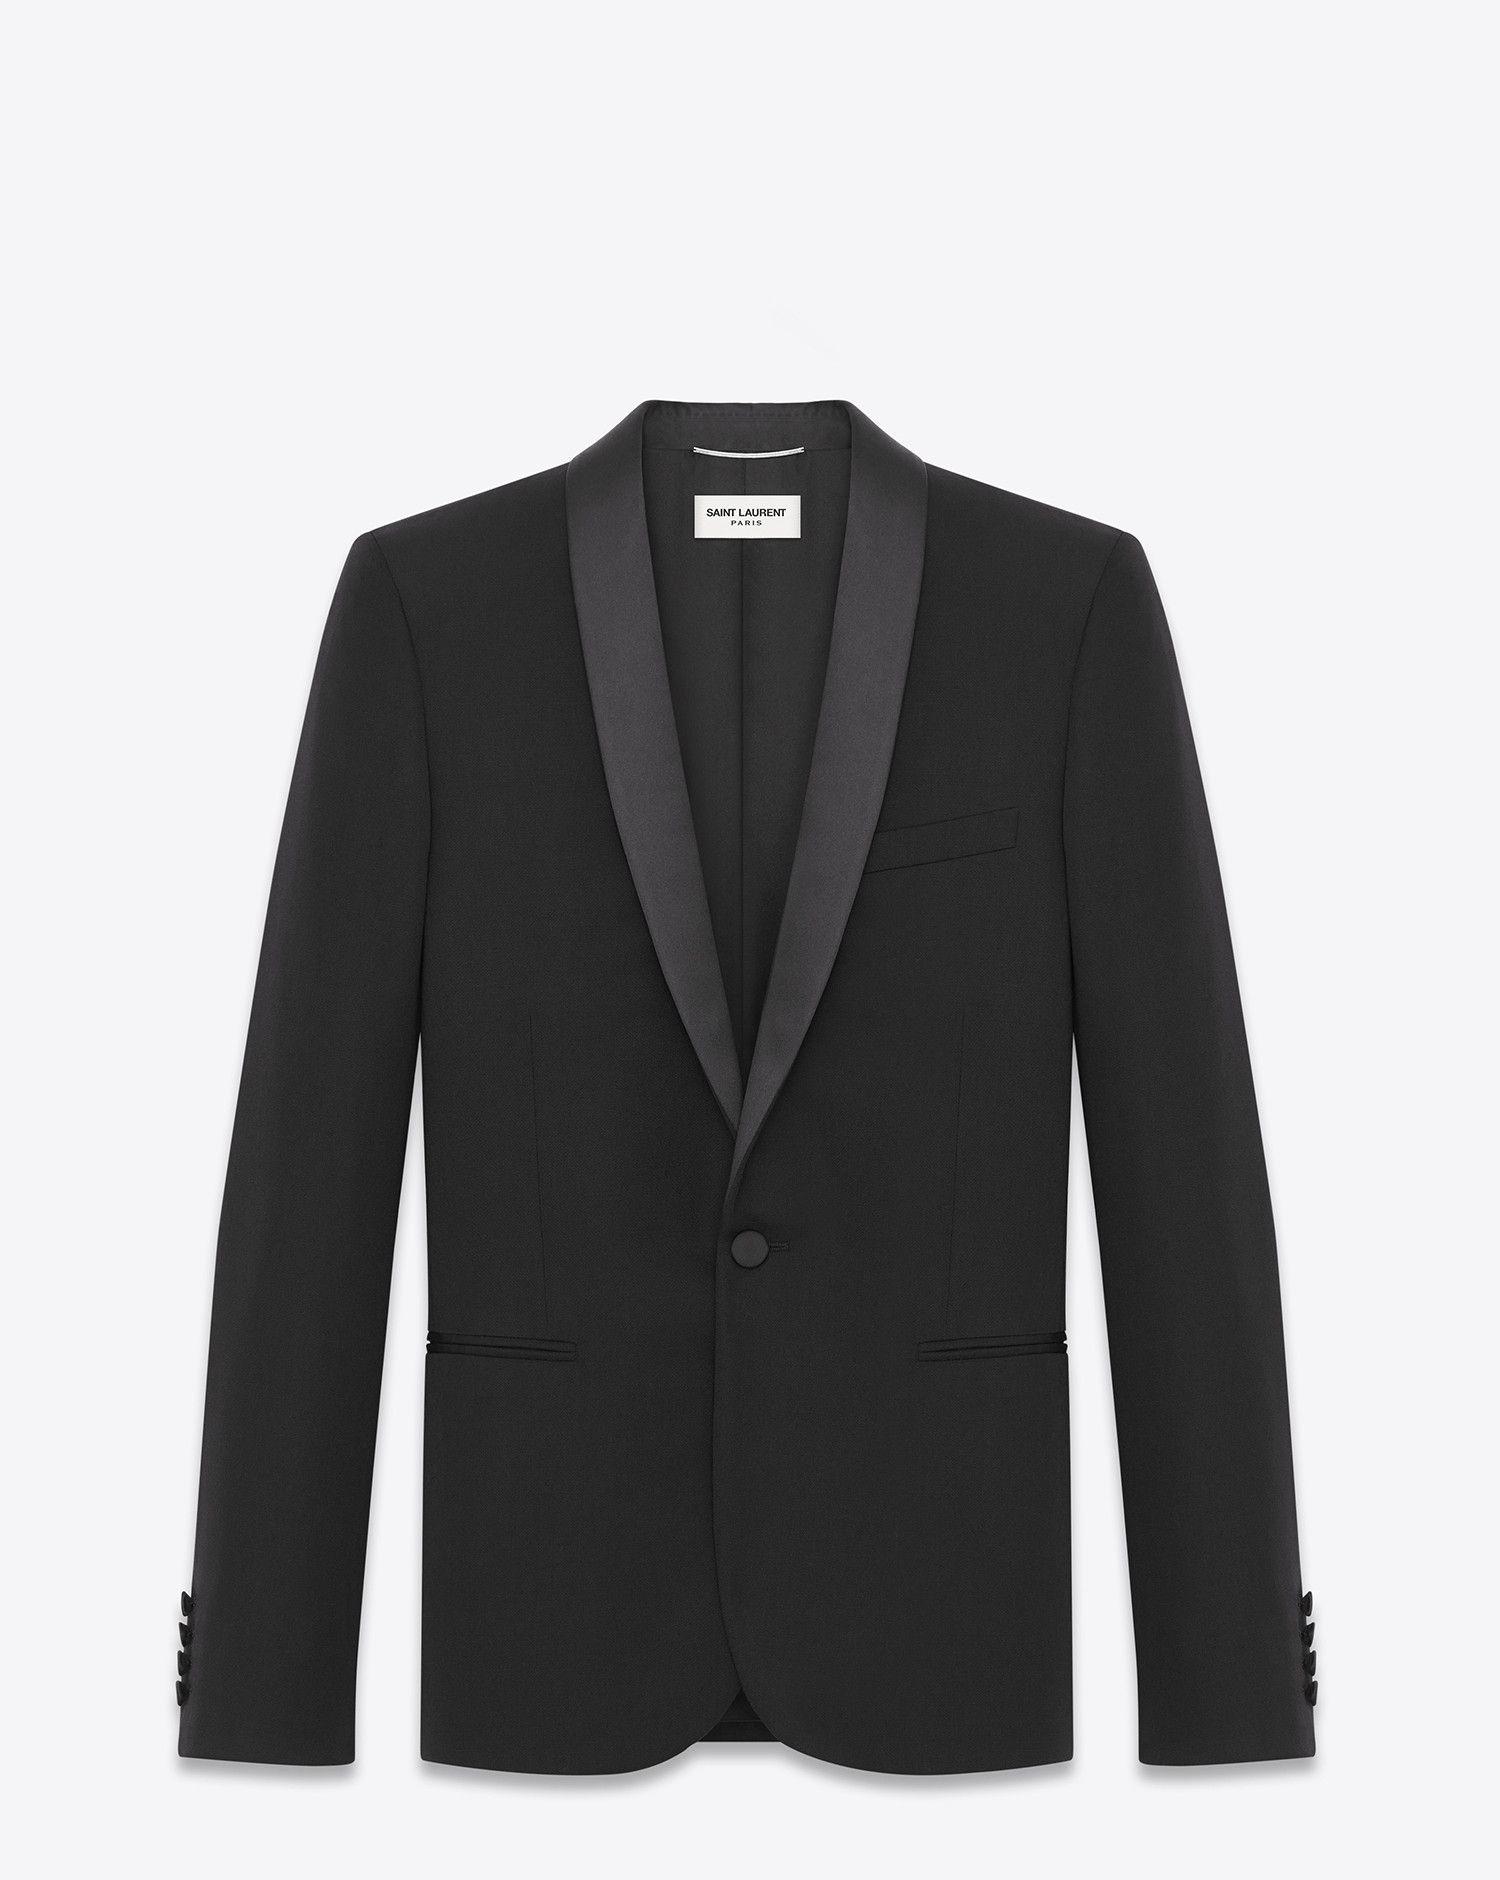 0aba104eed1 Saint Laurent Iconic Le Smoking Jacket In Black Grain De Poudre Textured  Wool - ysl.